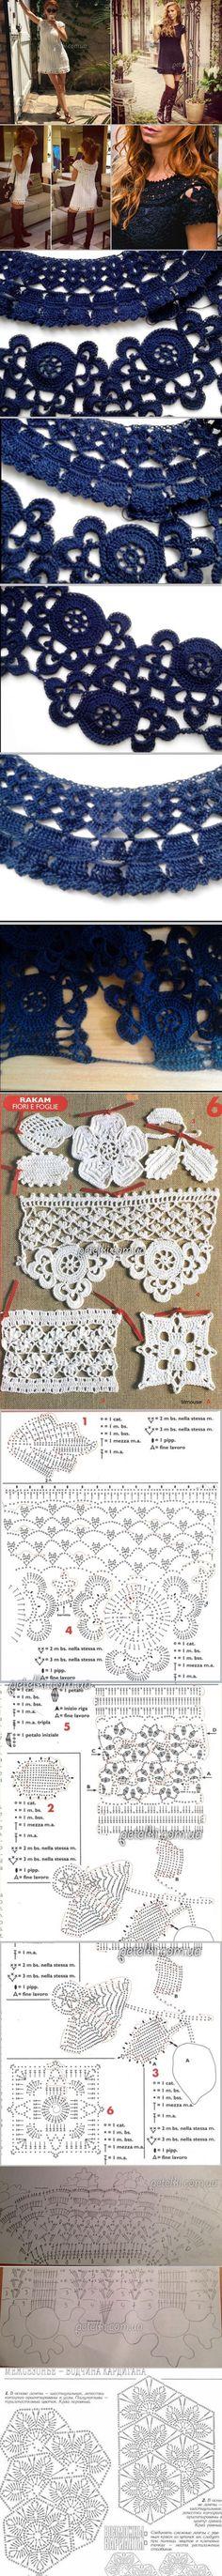 1566 mejores imágenes de Crochet School en 2019 | Yarns, Crochet ...